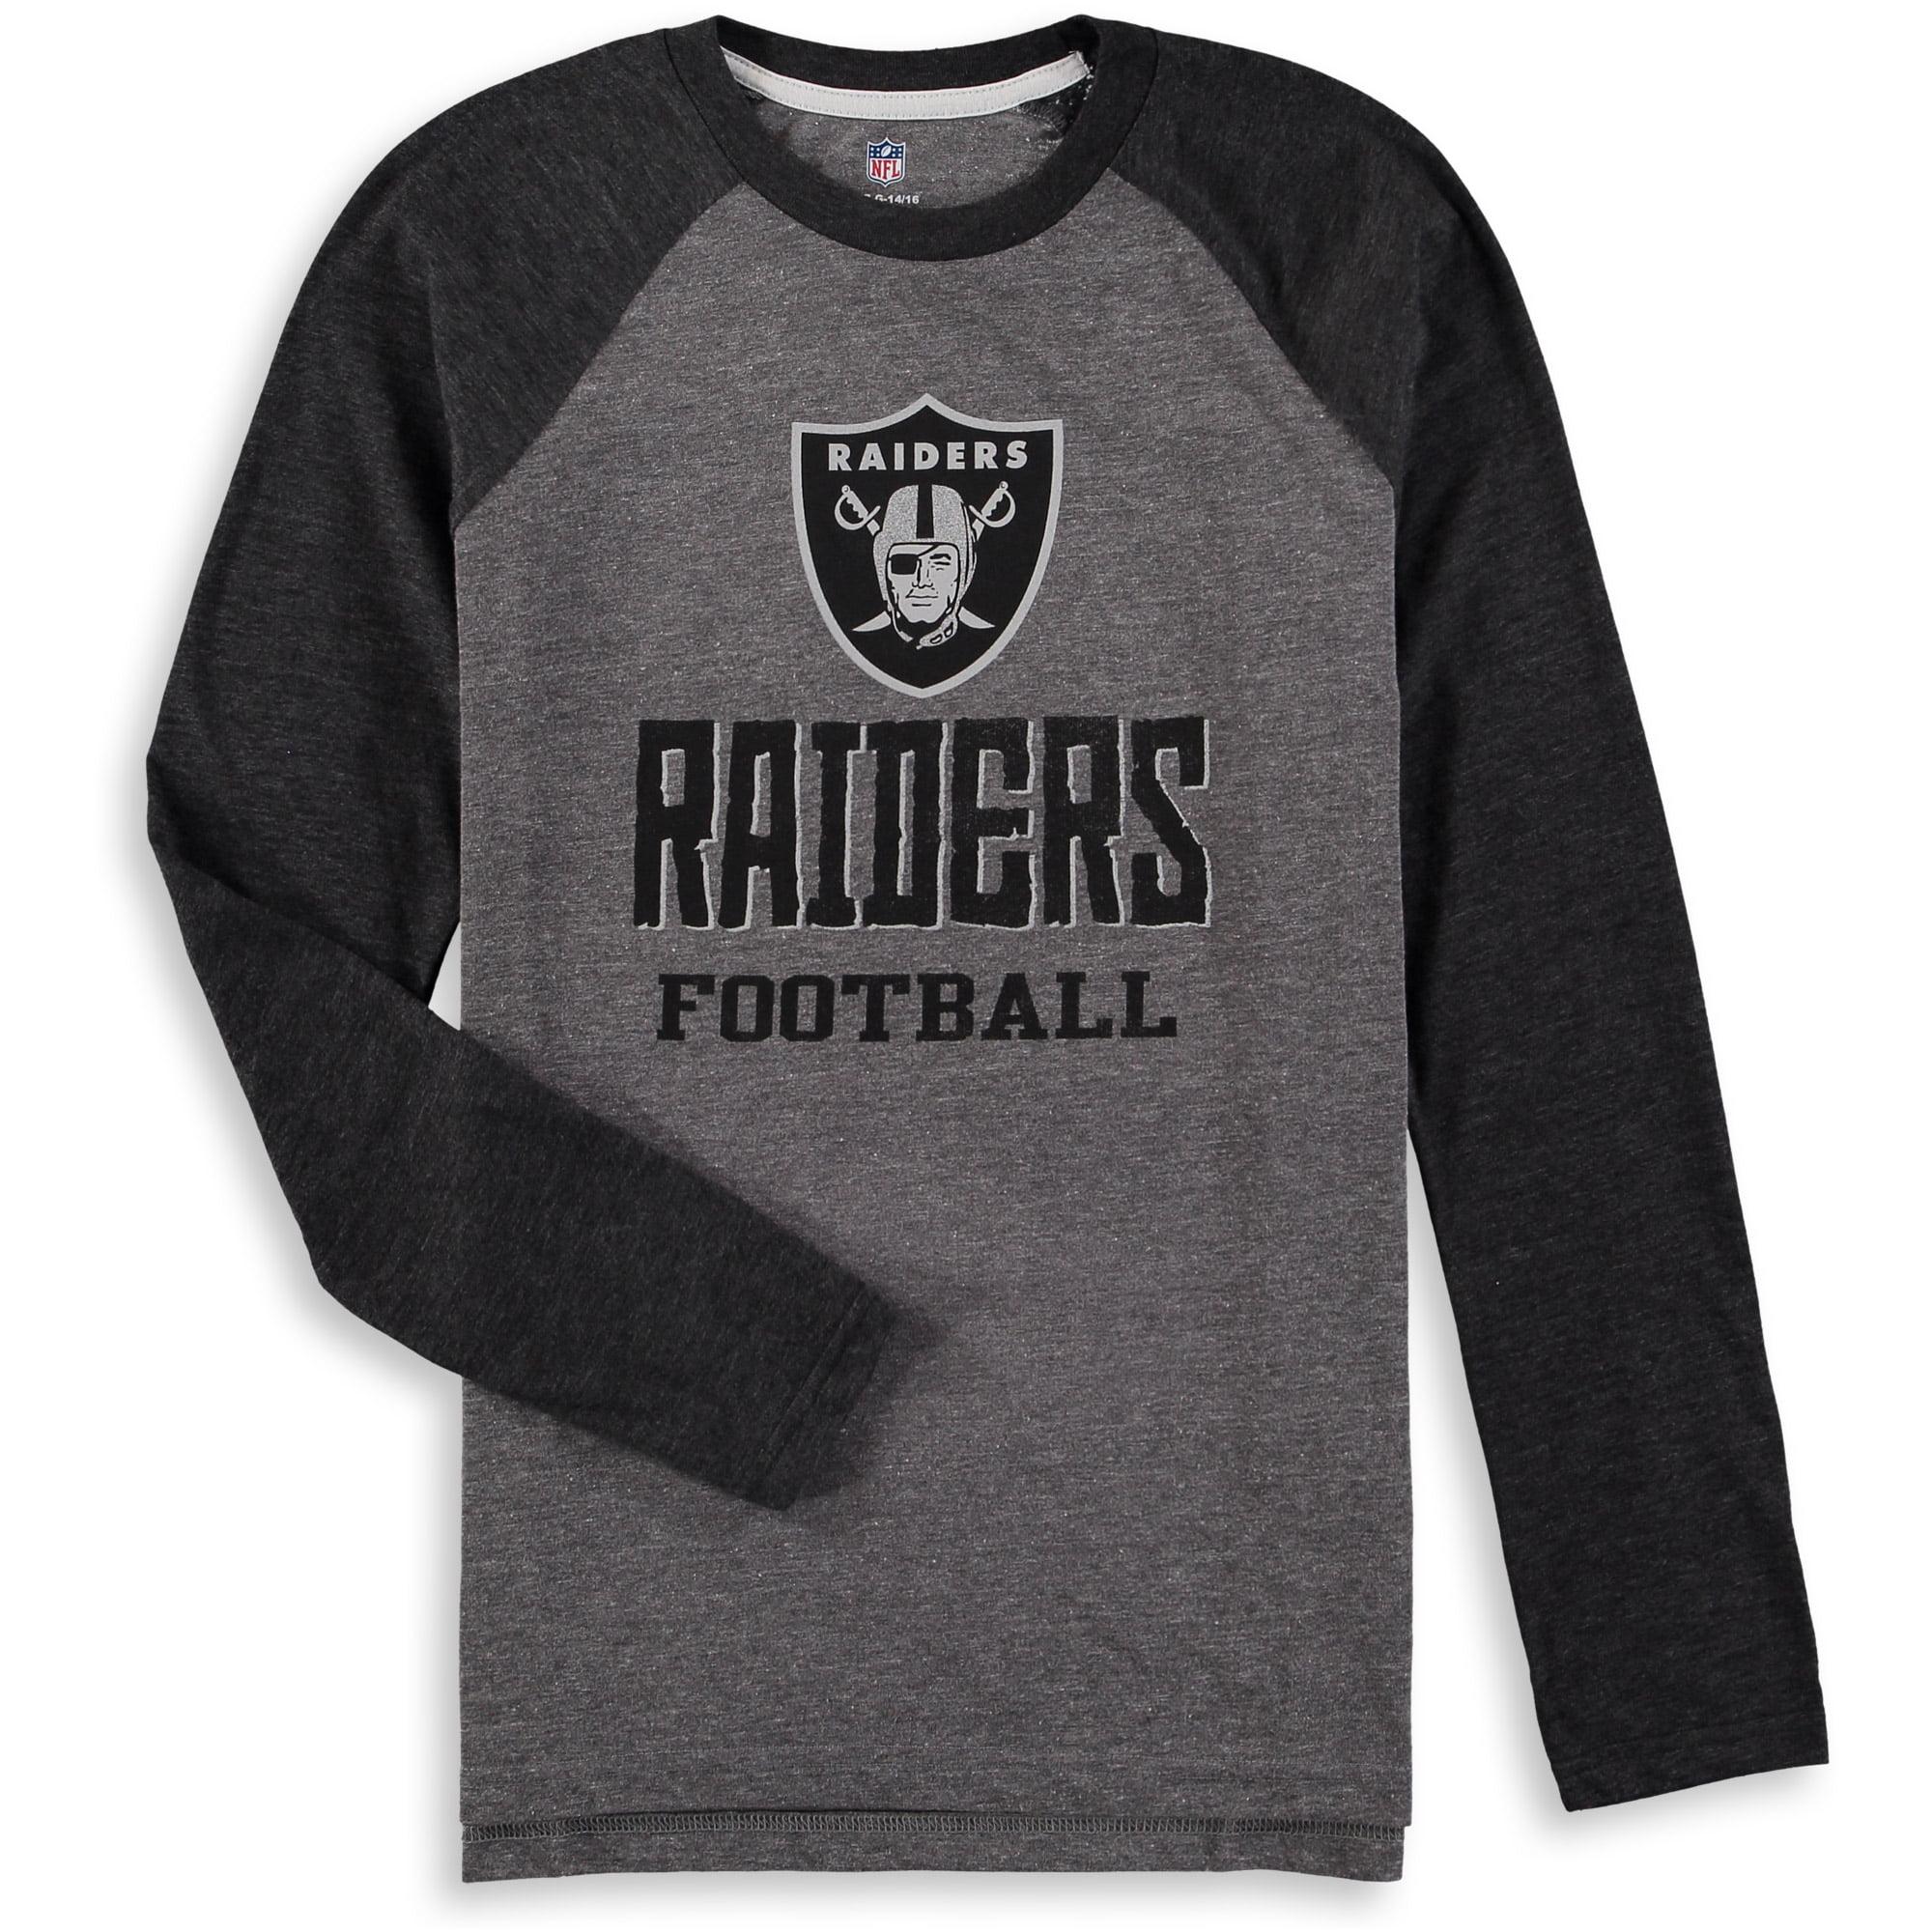 Oakland Raiders Youth Classic Gridiron Raglan Tri-Blend Long Sleeve T-Shirt - Heathered Gray/Heathered Black